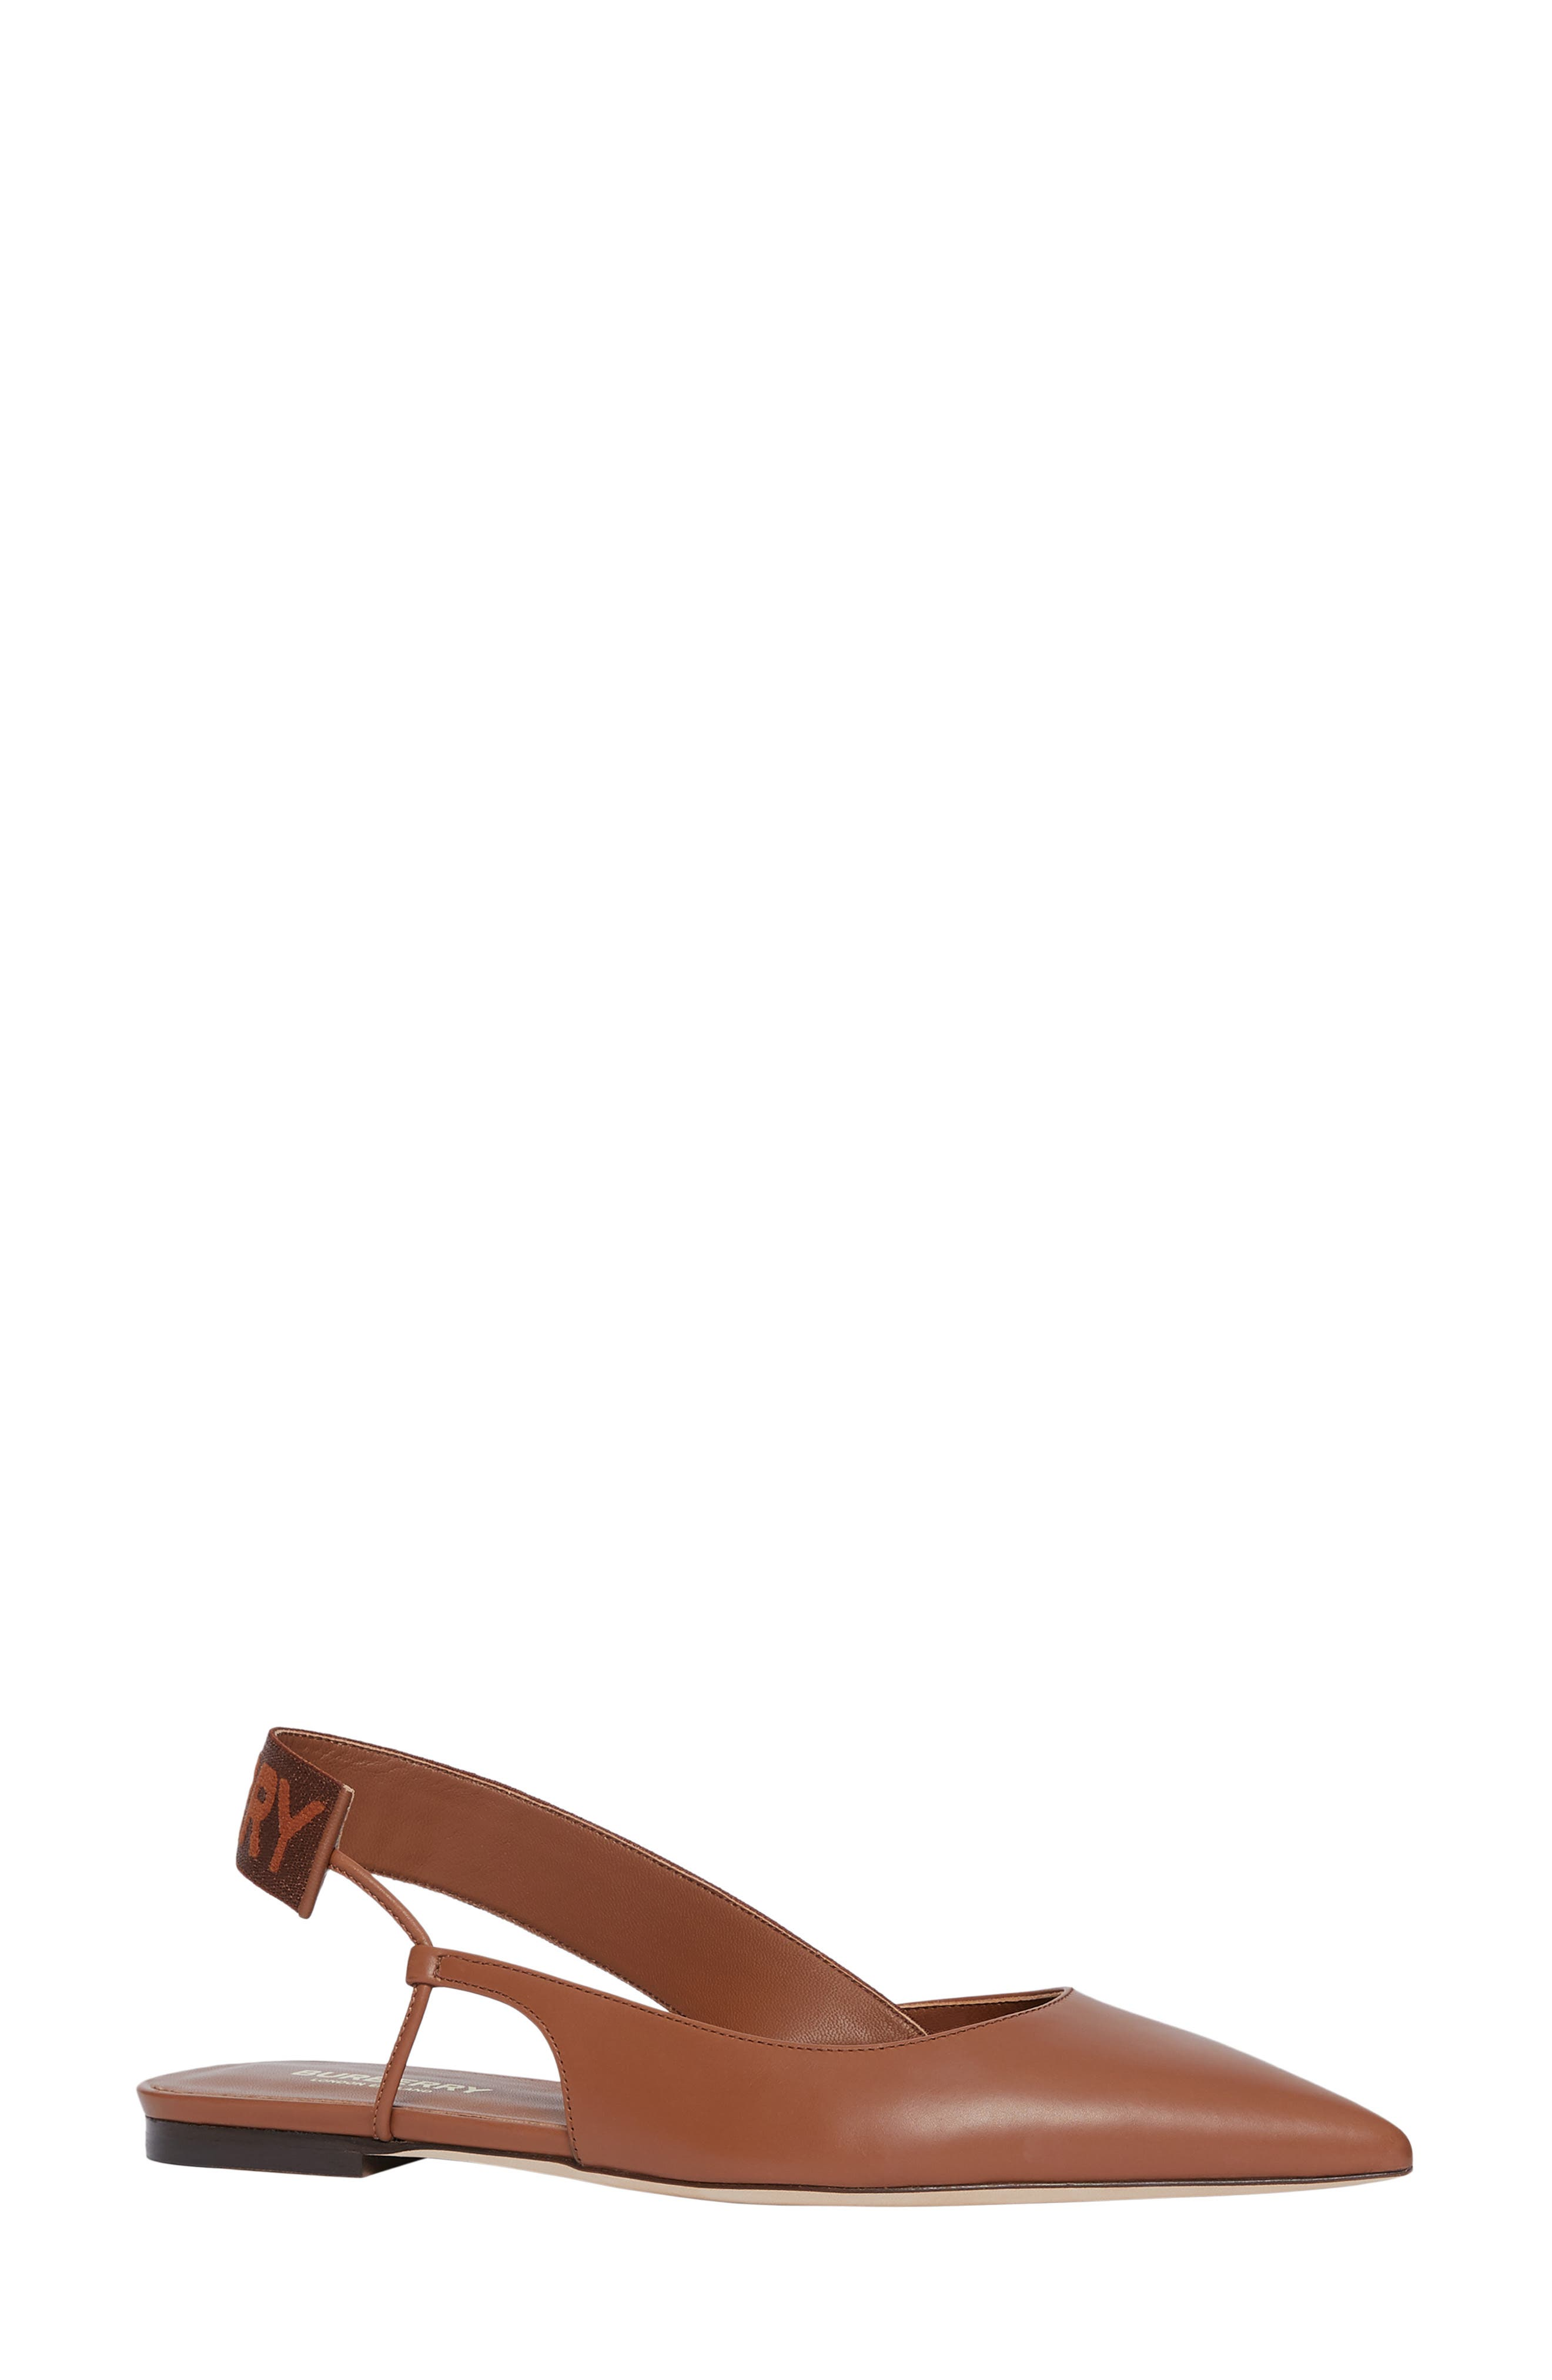 Burberry Maria Asymmetrical Slingback Flat - Brown